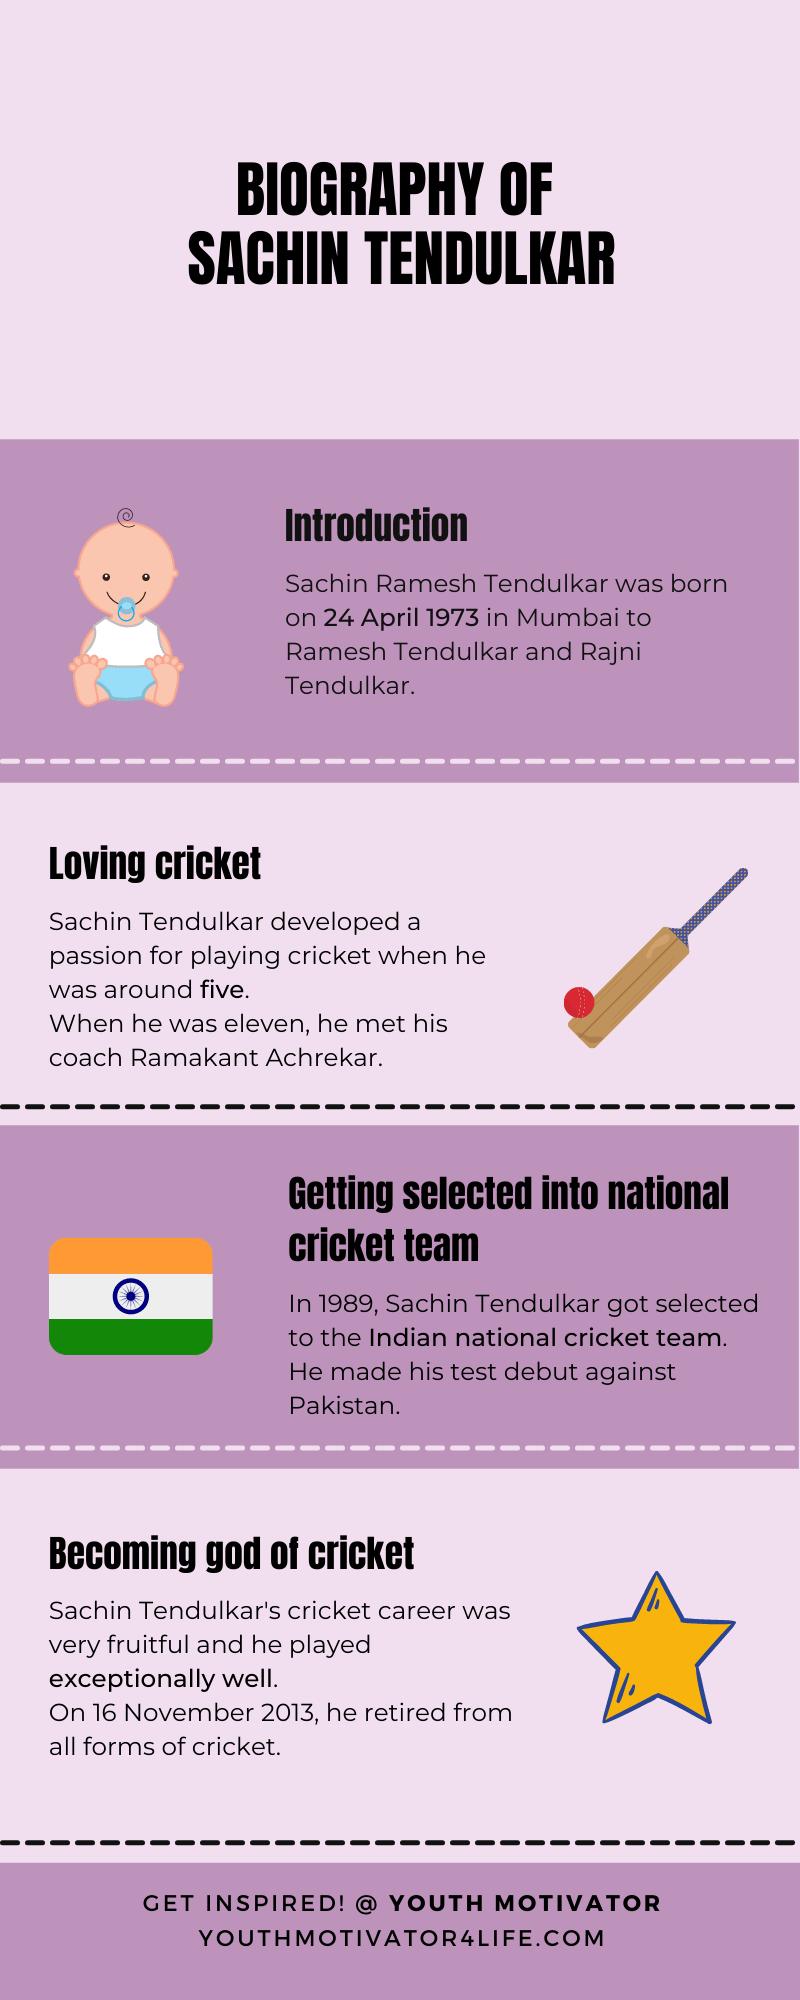 An infographic on biography of Sachin Tendulkar